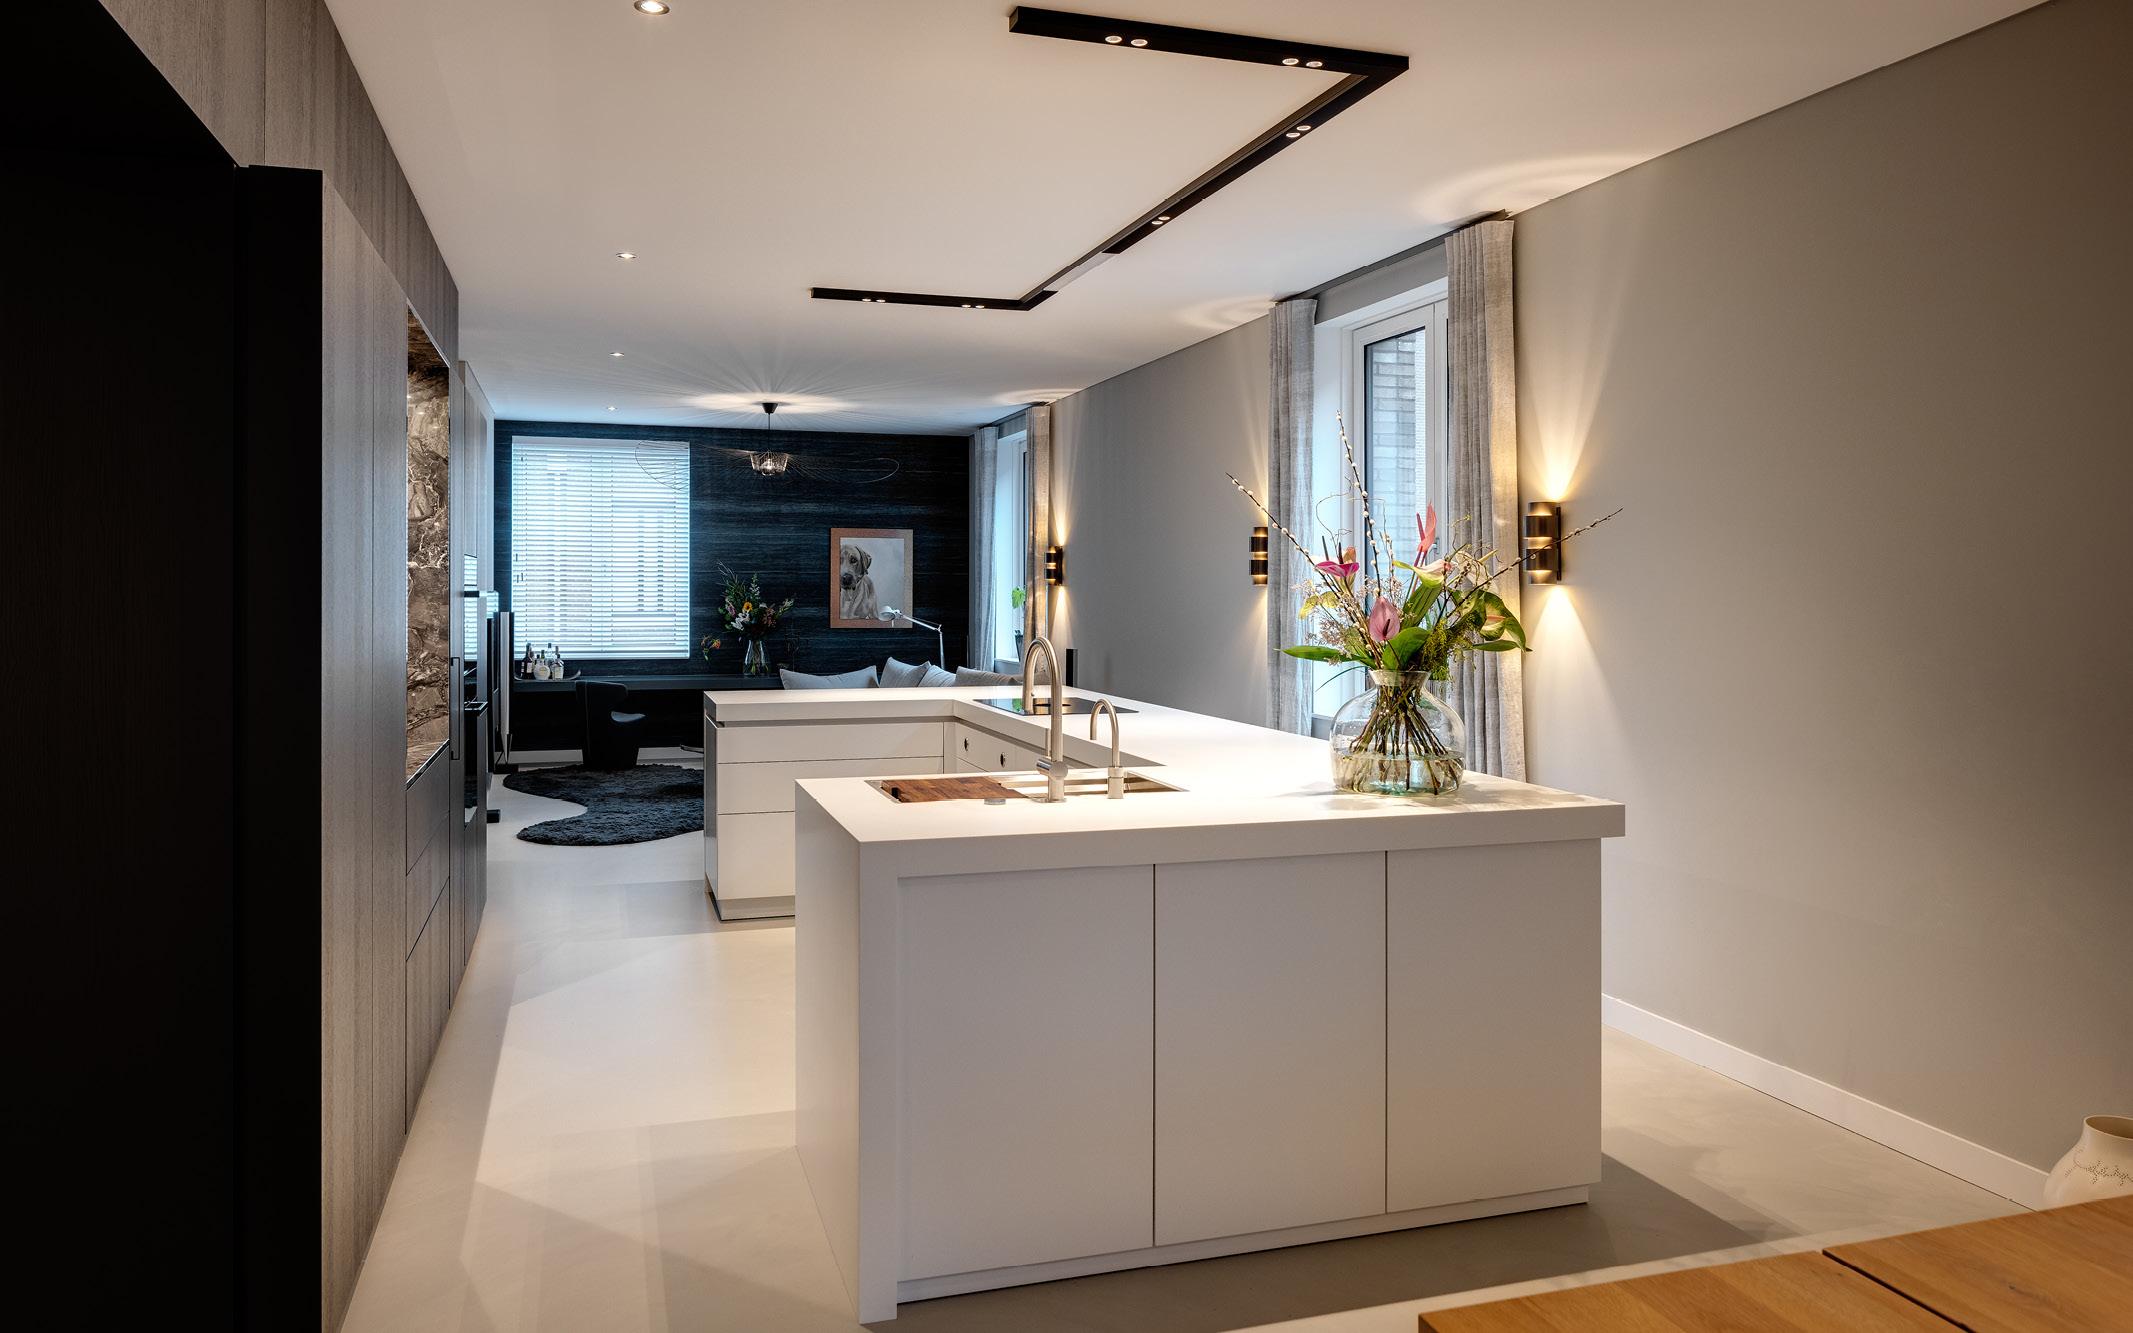 Culimaat | design keuken, the art of living